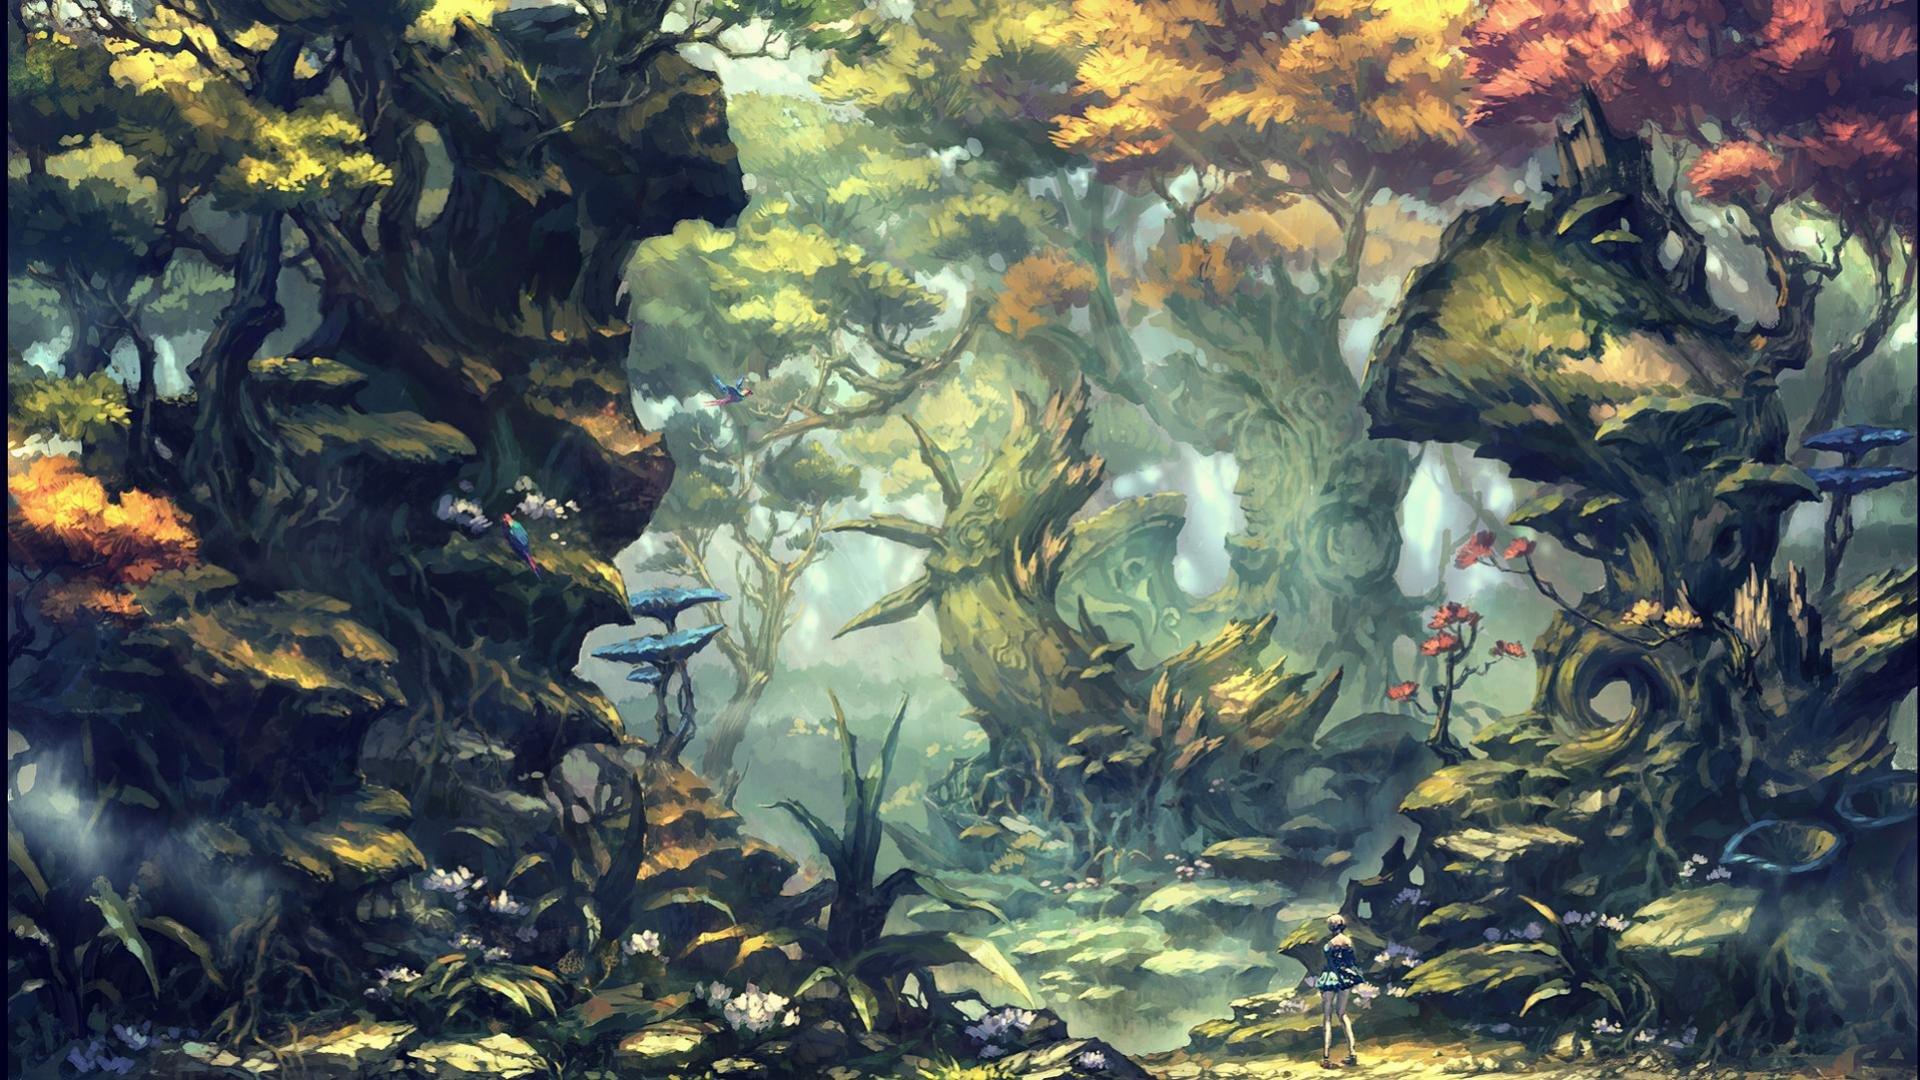 Fantasy Forest Wallpapers 1920x1080 Full Hd 1080p Desktop